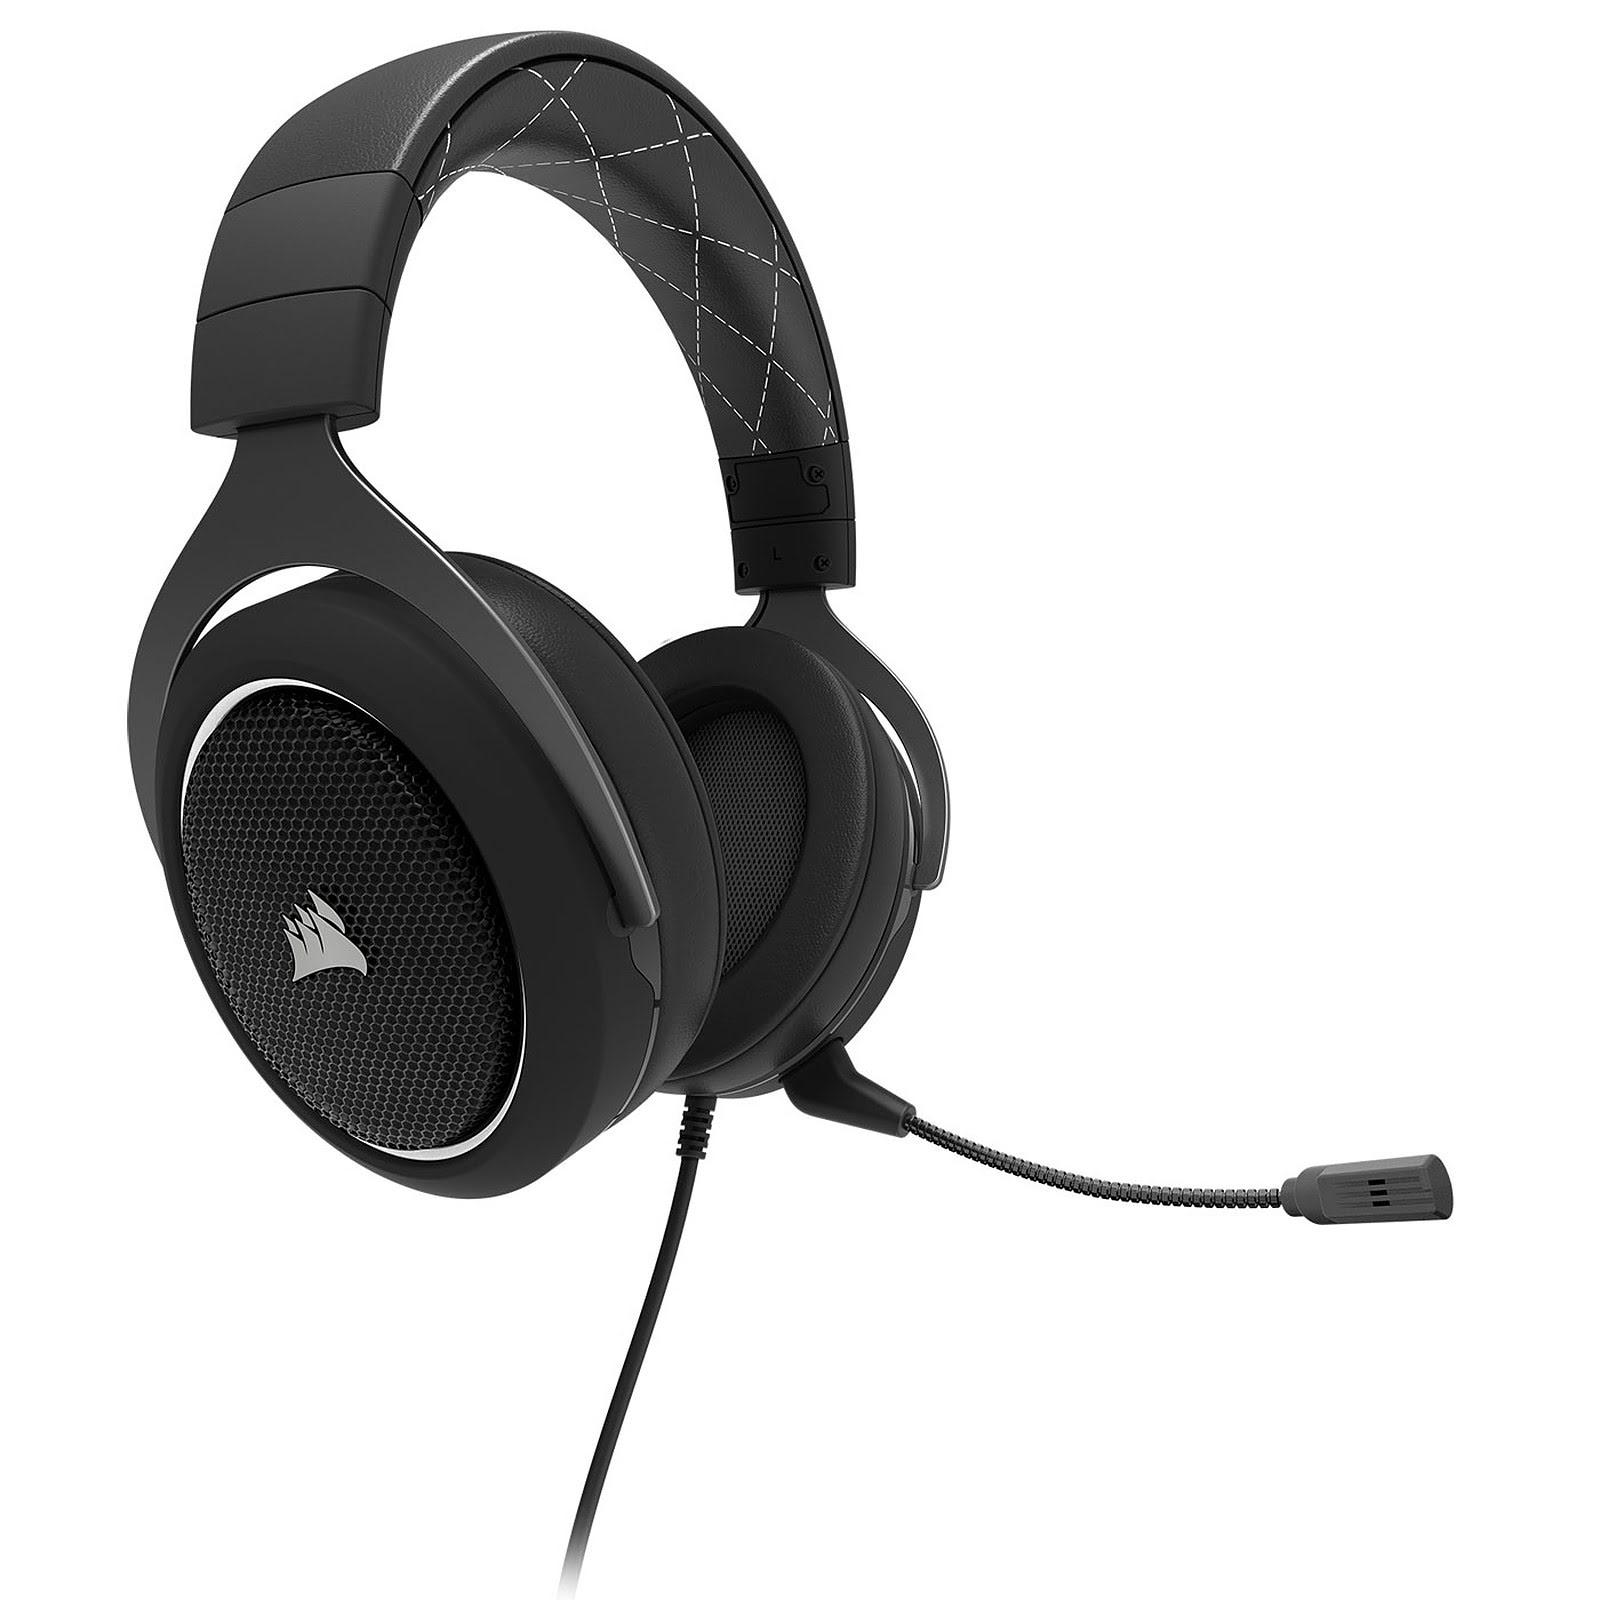 HS60 Surround White (CA-9011174-EU) - Achat / Vente Micro-casque sur Picata.fr - 0